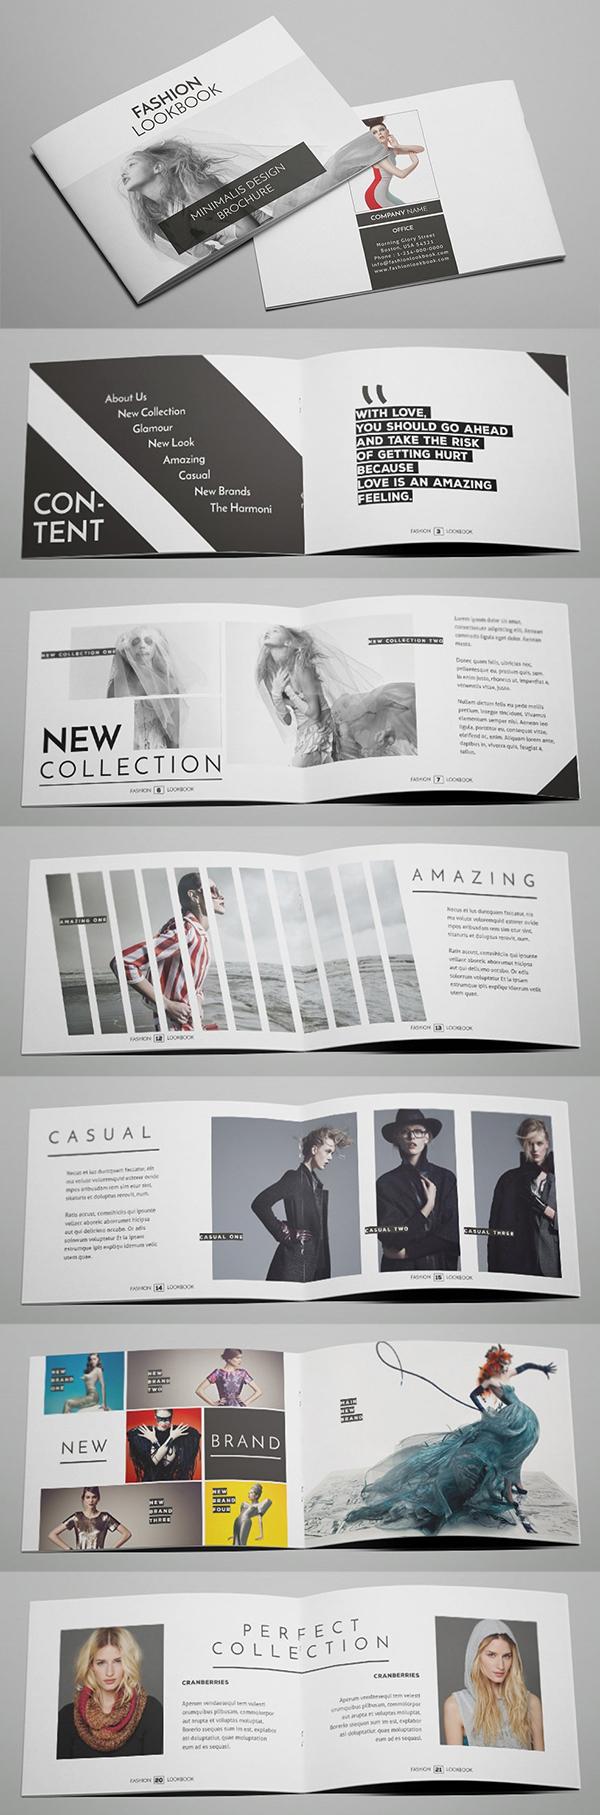 Fashion Brochure / Catalog Design Template